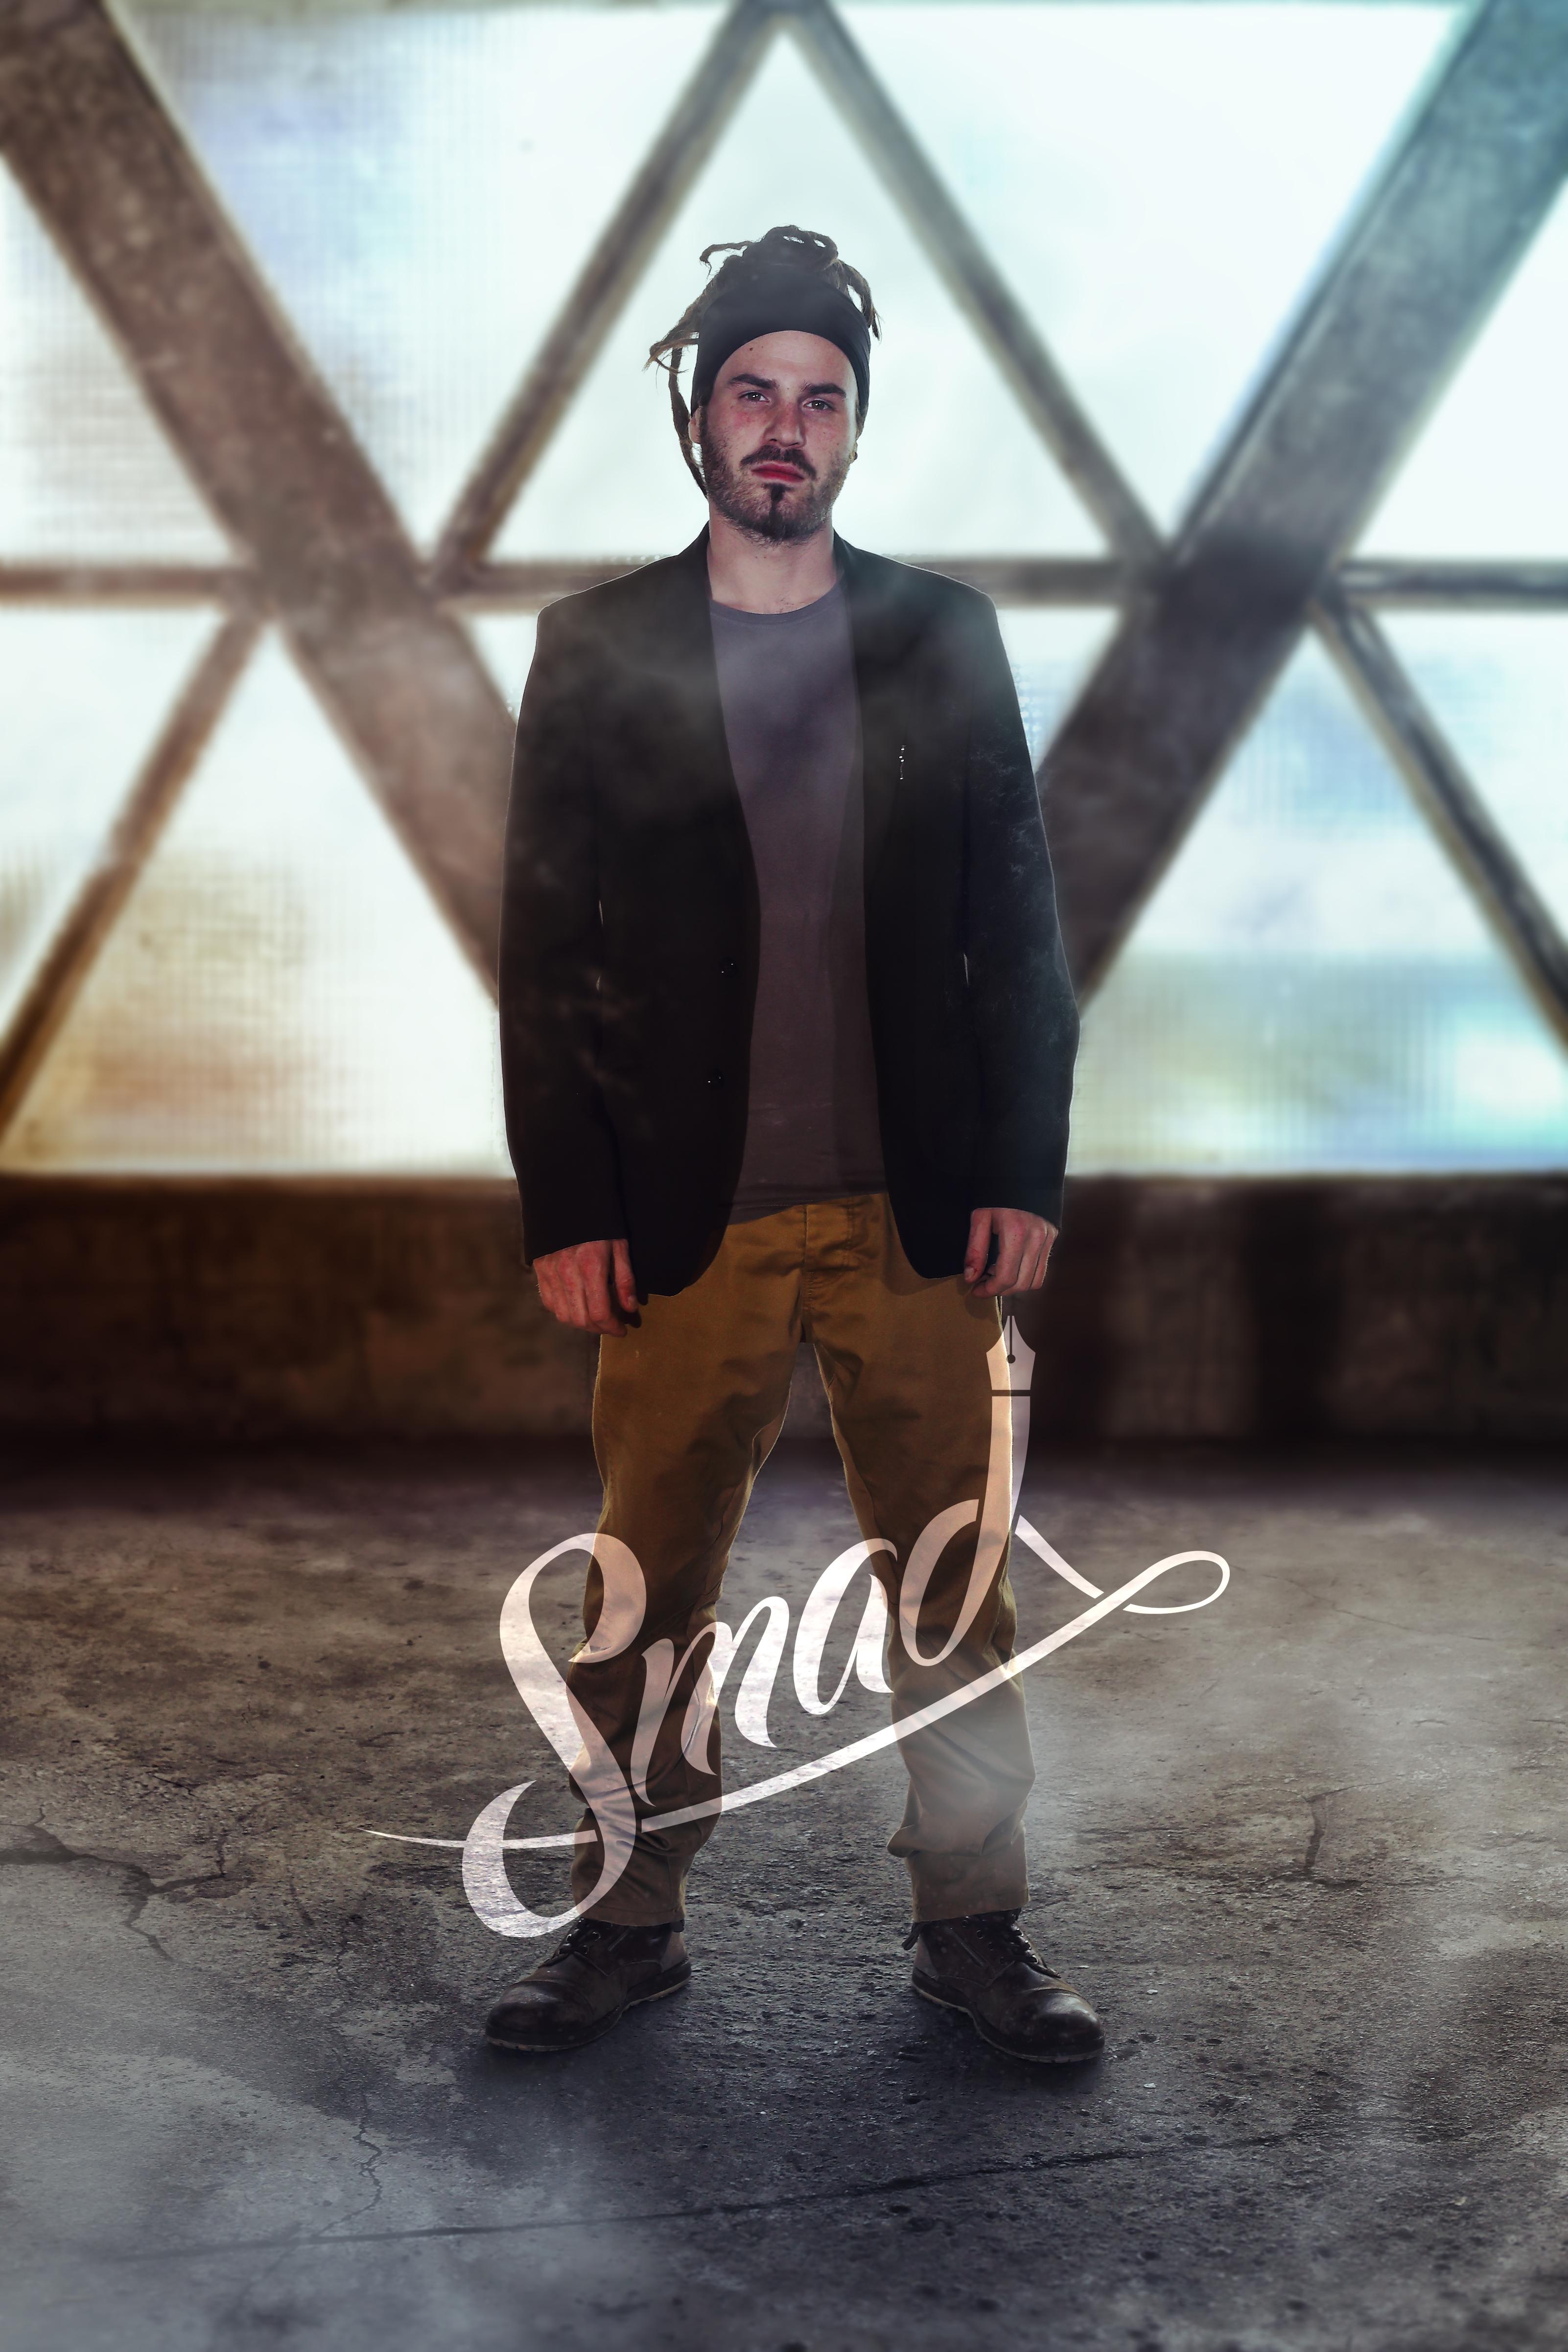 SMAD artwork by Yok's